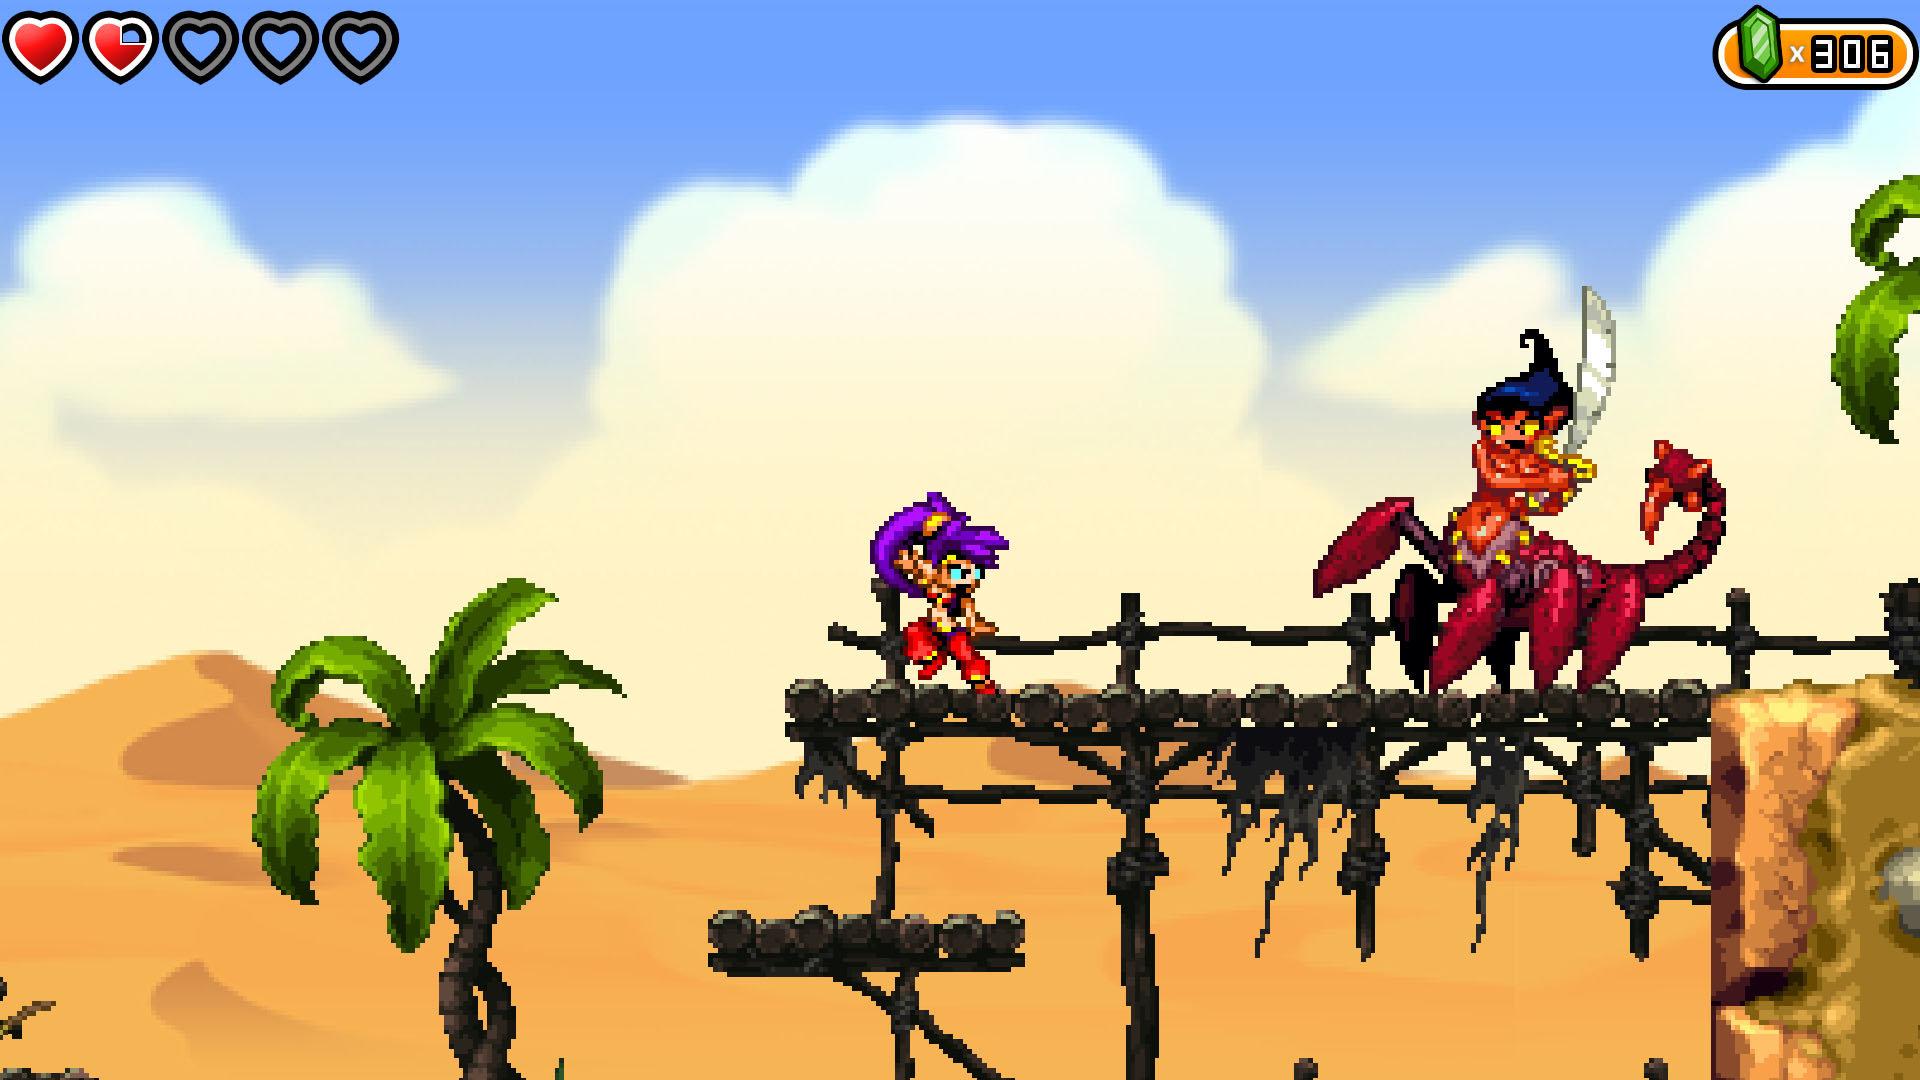 shantea-and-the-pirates-curse-screen-05-ps4-us-19apr16